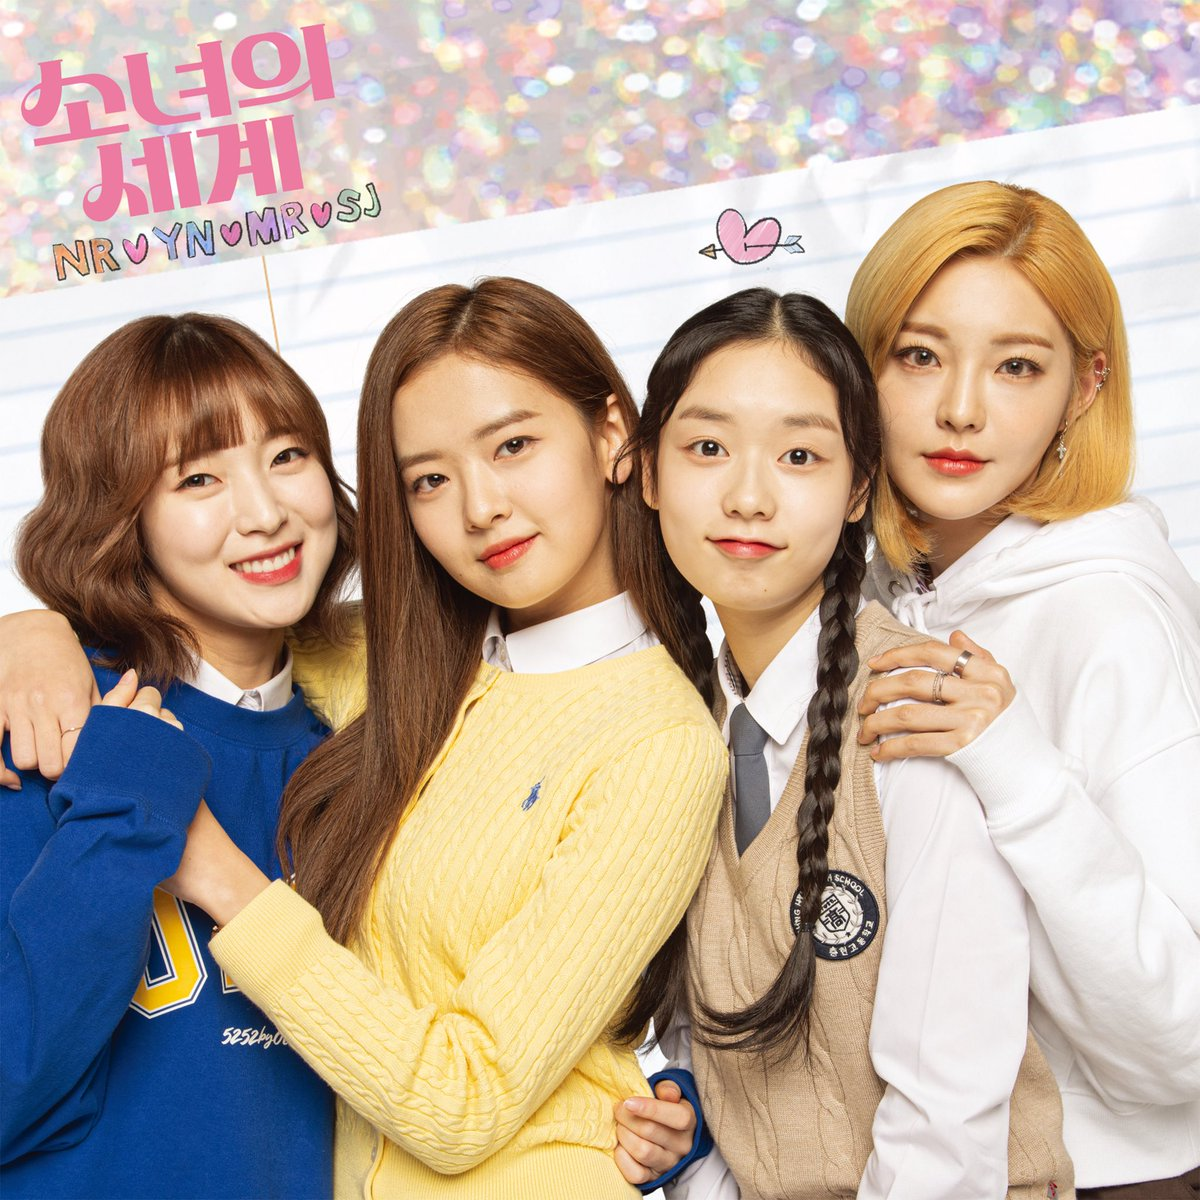 #VIINI (권현빈)의 자작곡 #소녀의세계 #OST Part 4 #너의편 이 발매되었습니다. 많은 관심과 사랑 부탁드립니다.  #권현빈 #비니 #KwonHyunBin #웹드라마 #웹드 #소세 #오에스티 #Friends #YGX #YG